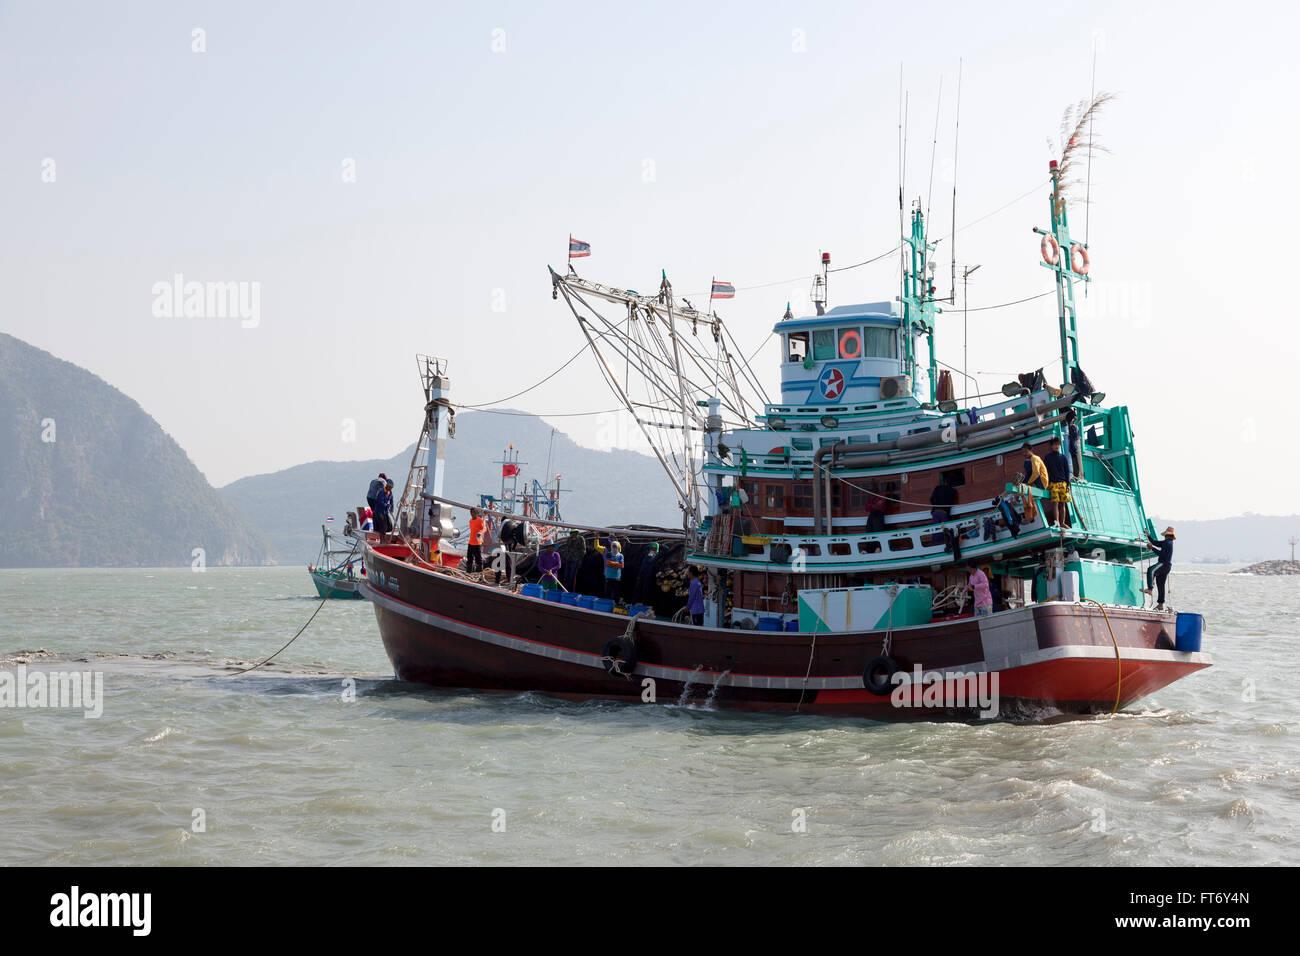 A Thai trawler equipped by lamplights for deep-sea fishing (Ao Khlong Wan - Prachuap Khiri Khan province - Thailand). - Stock Image